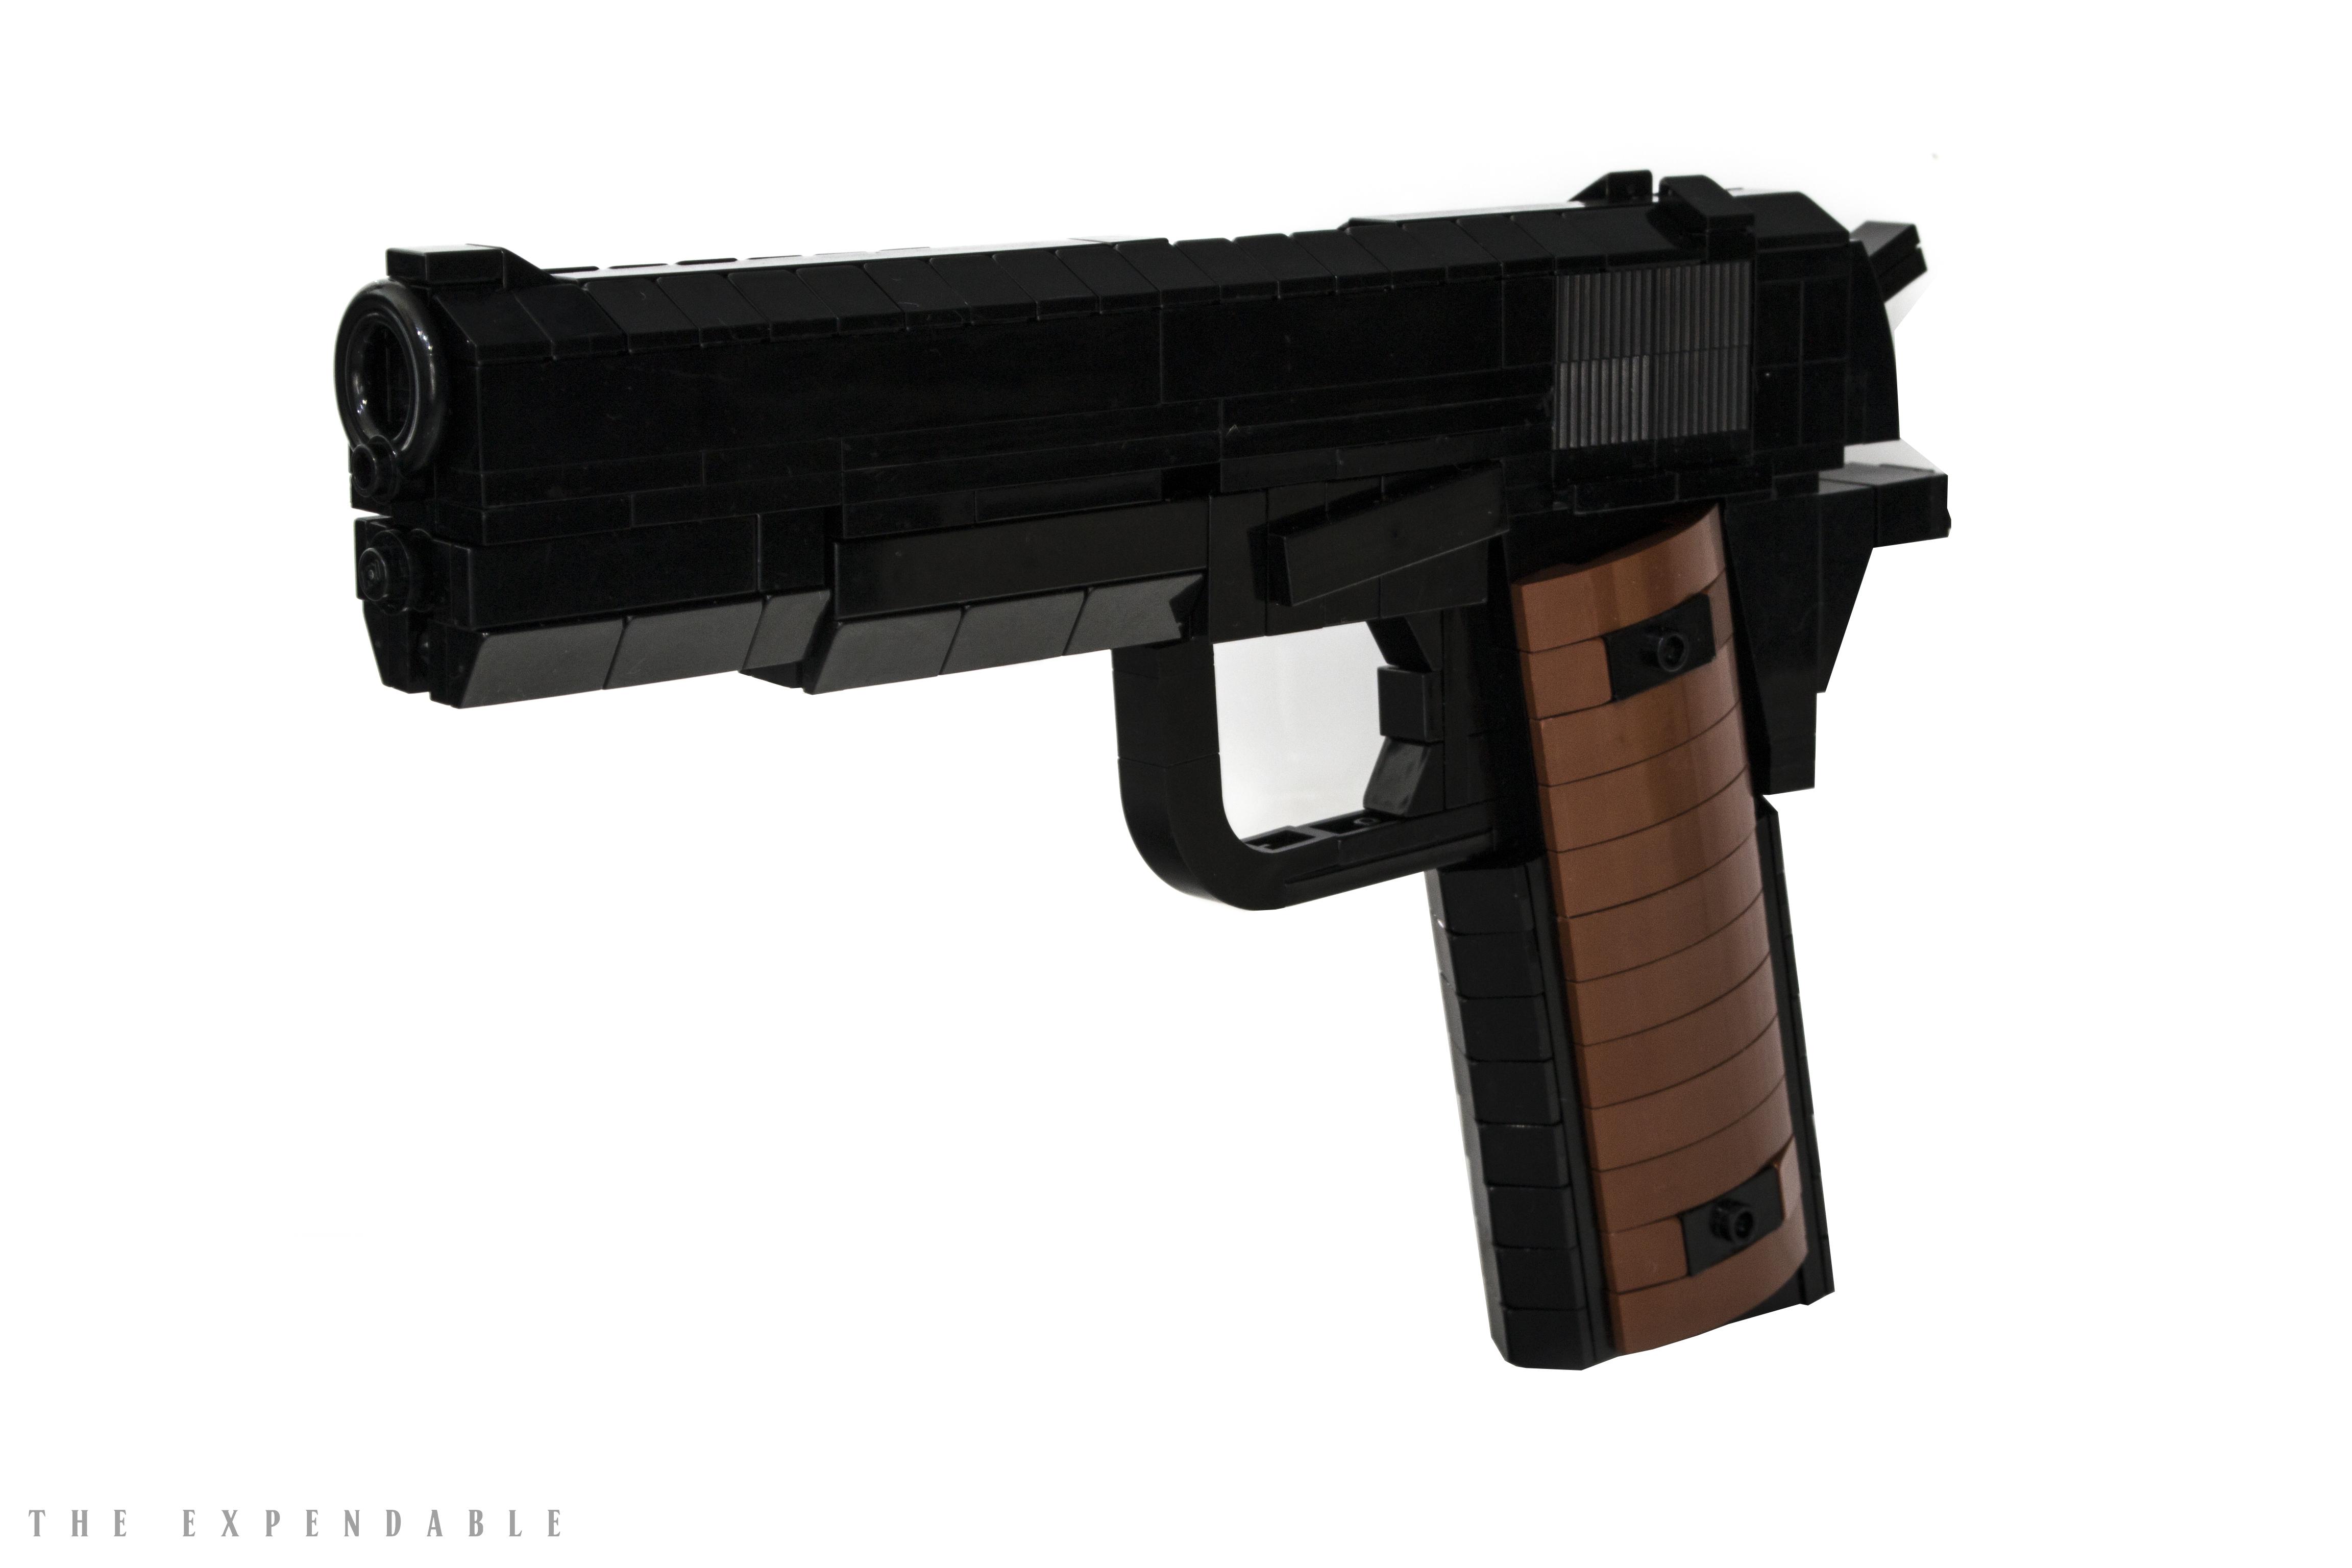 LEGO Pistol Handgun Colt 1911 Browning M1911